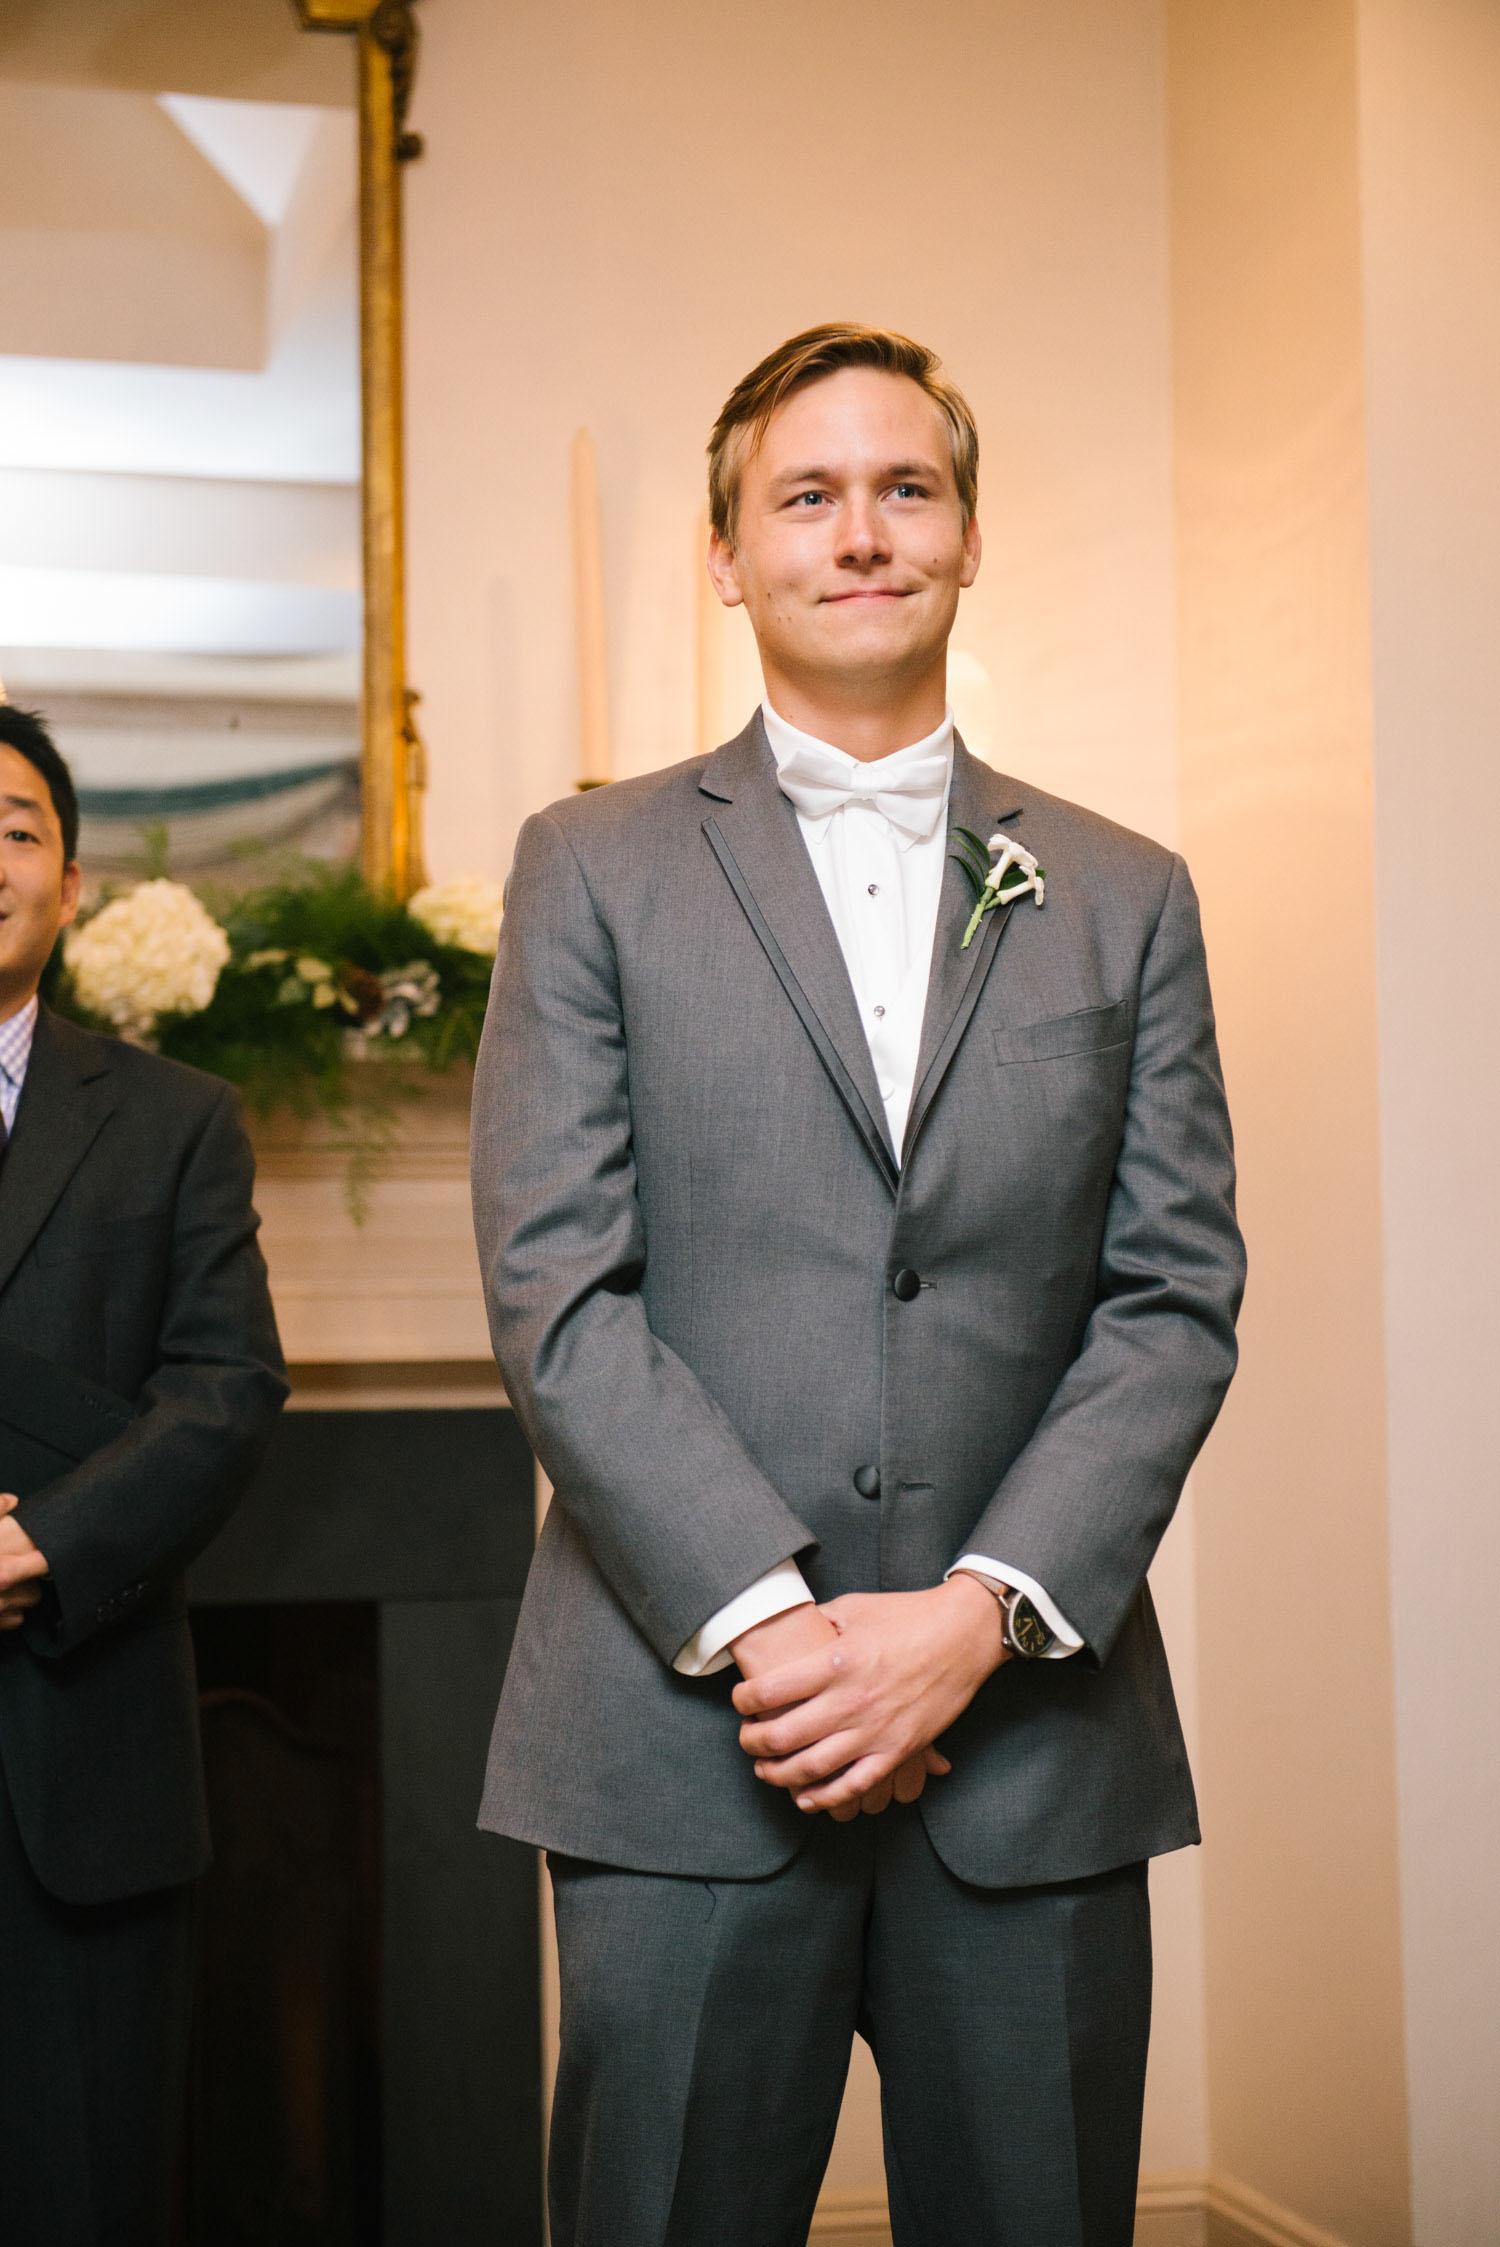 youngstrom-wedding-107.jpg